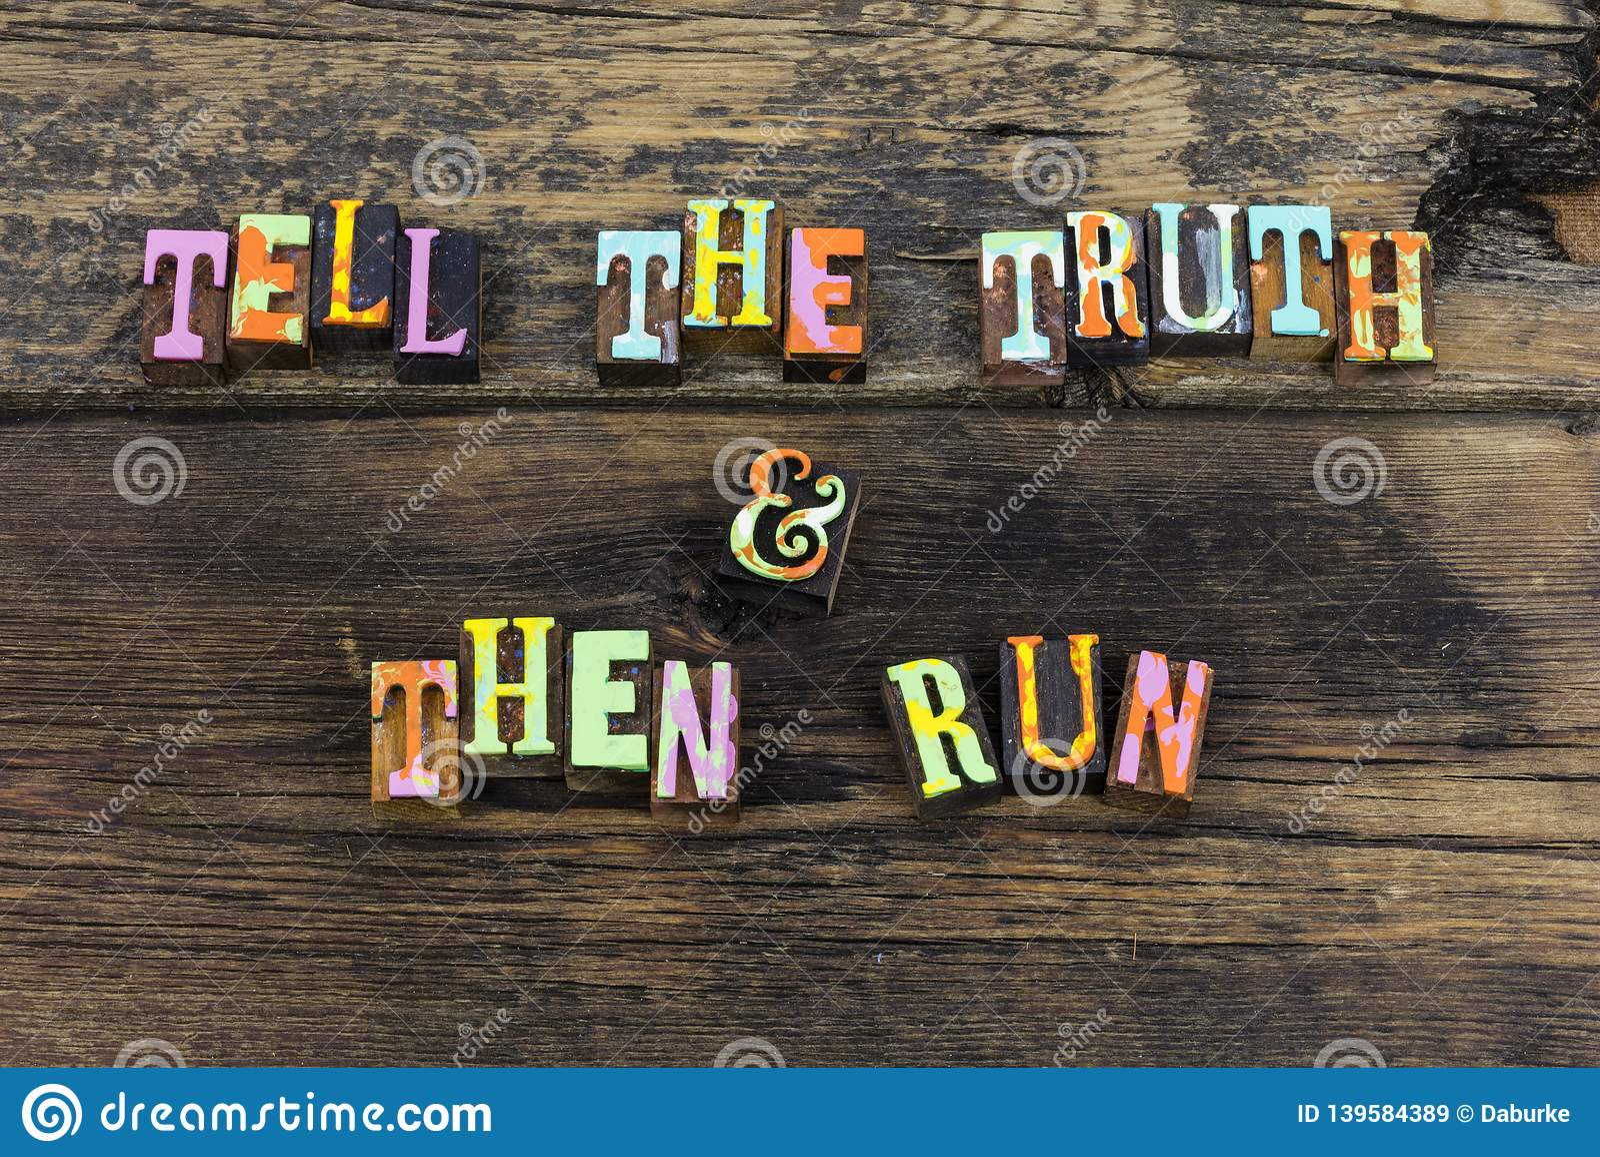 Tell truth run honesty respect integrity letterpress